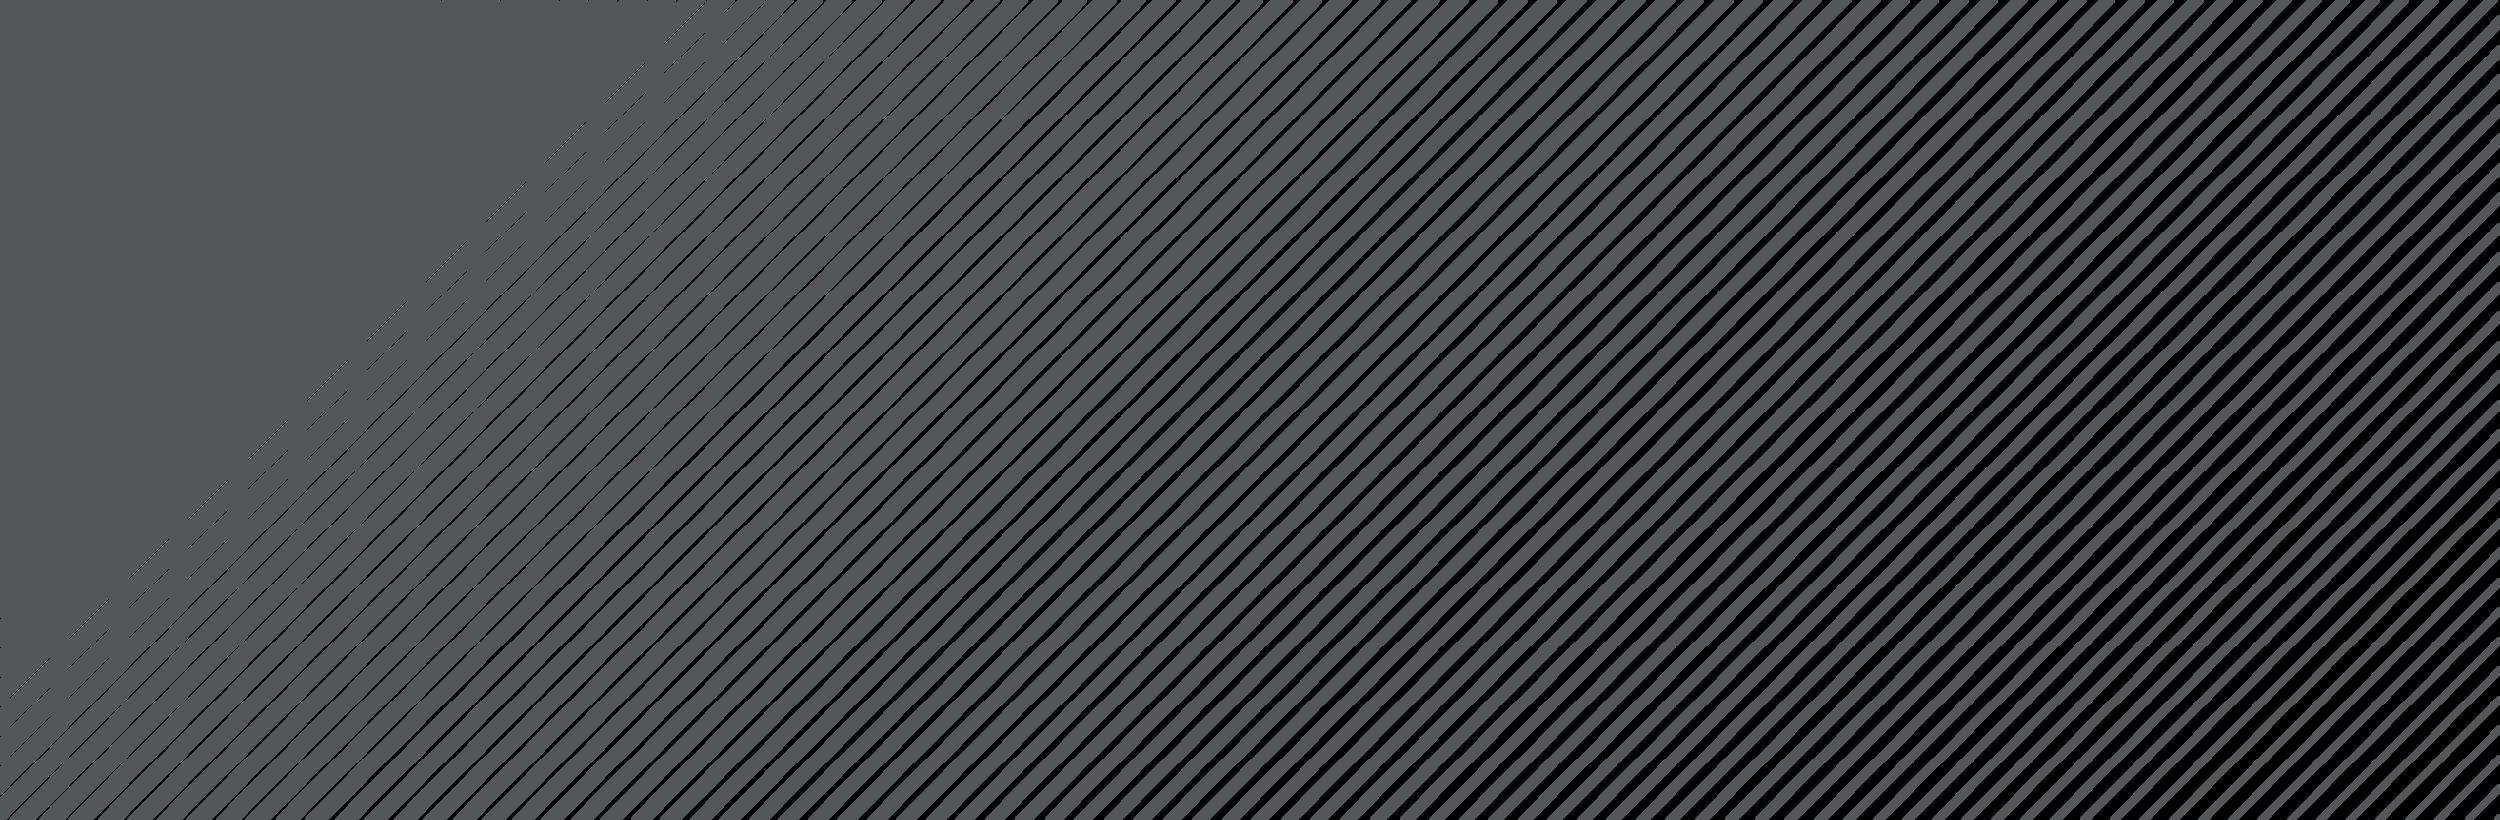 Evolving Hash Pattern